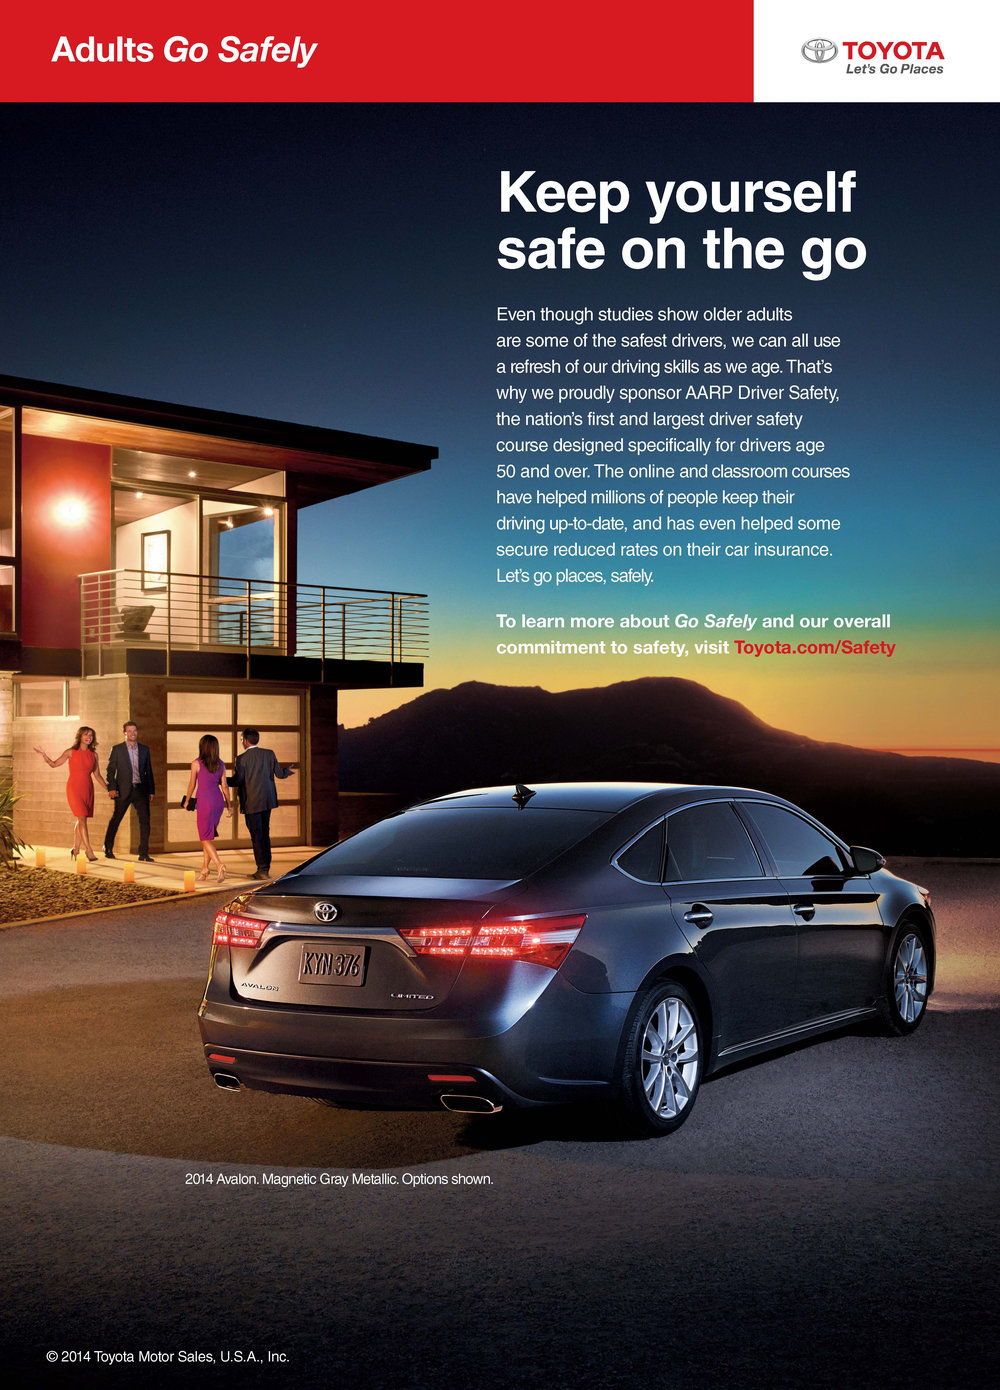 AARP Magazine ad for Toyota